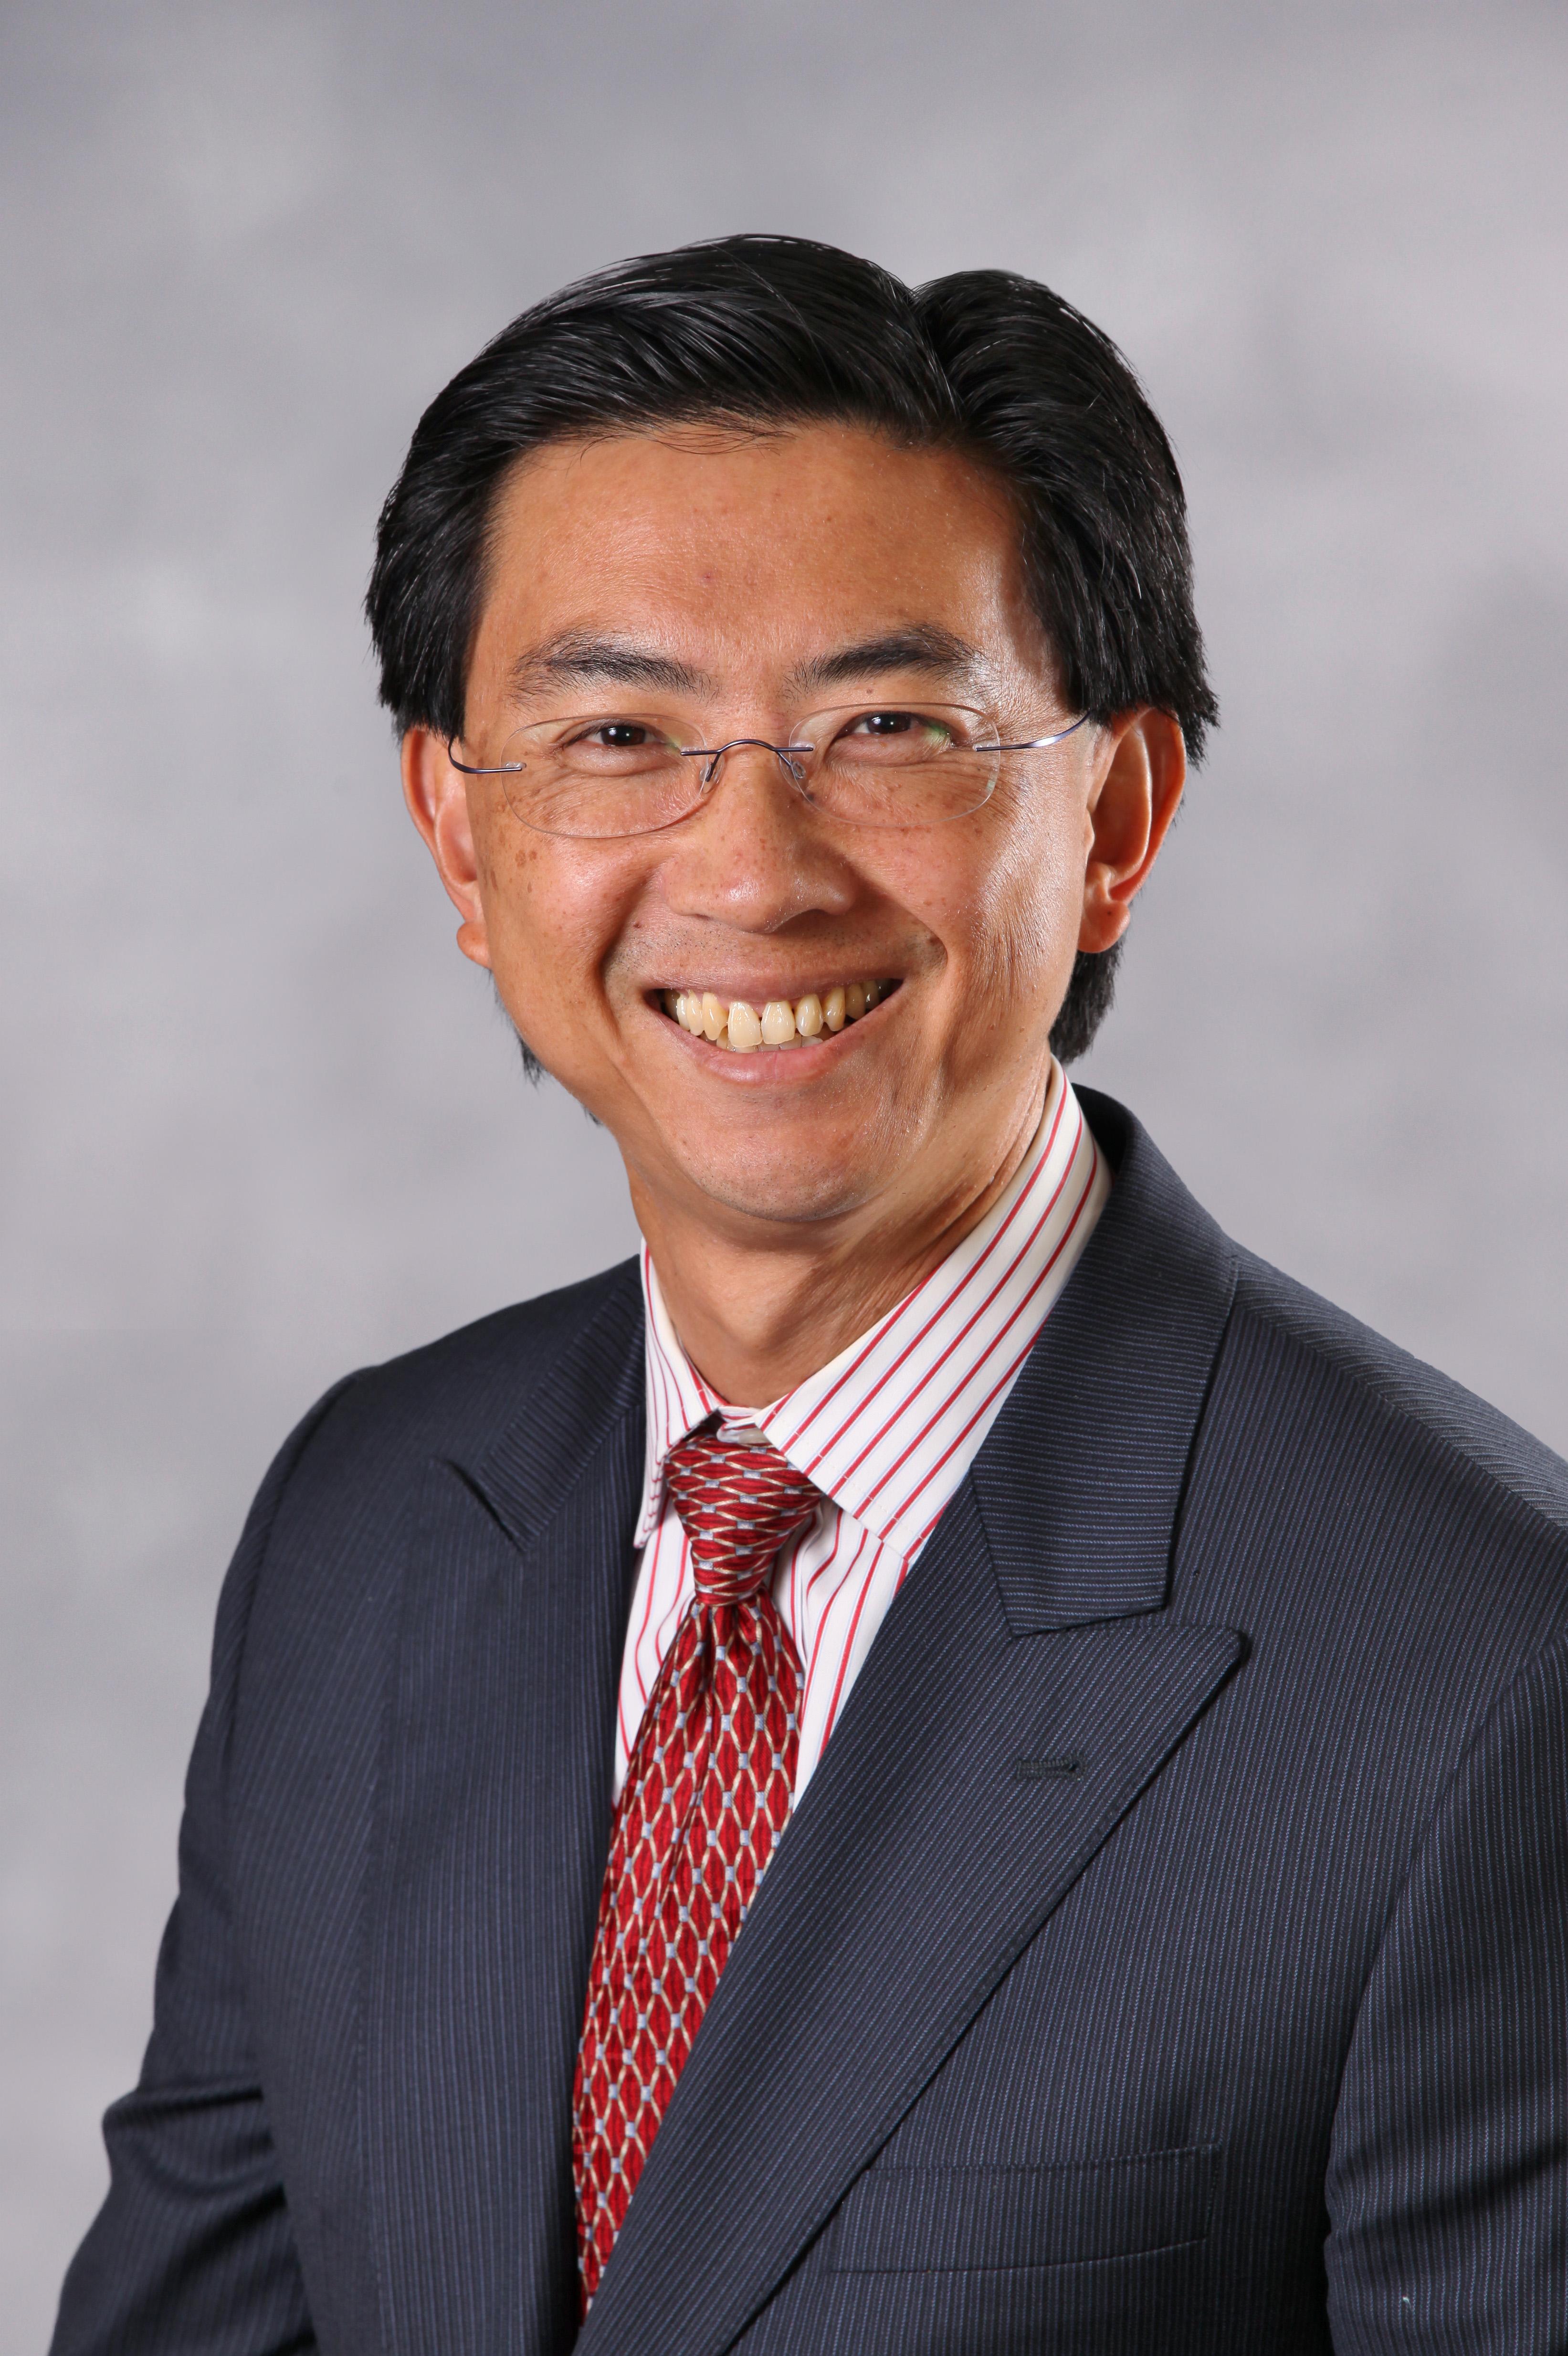 Tso-Jen Hsiao